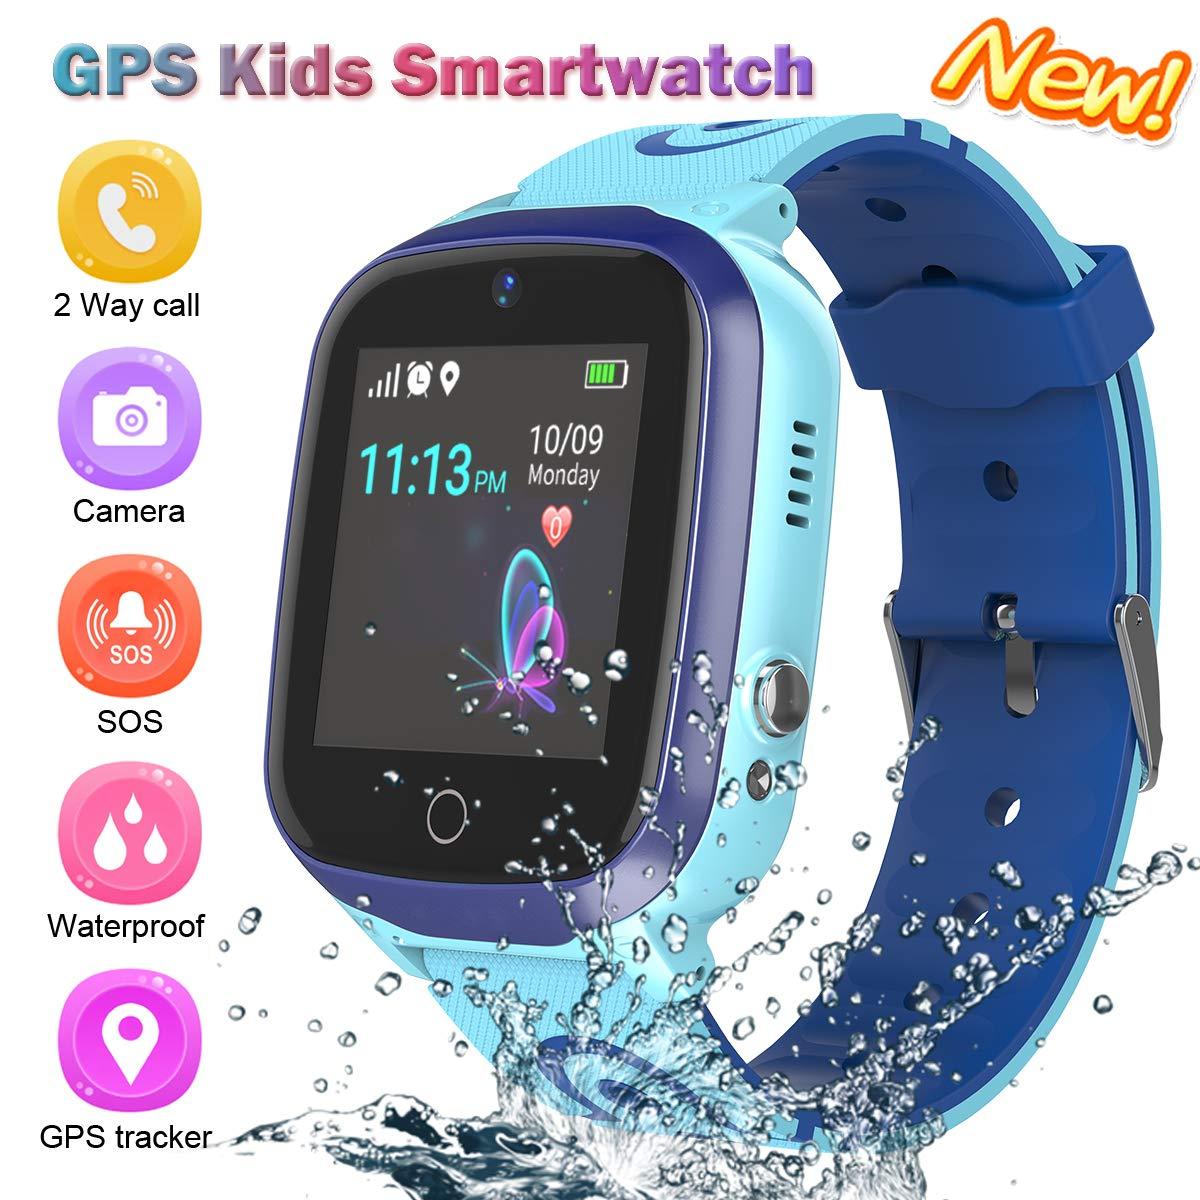 Kids Smart Watch for Boys Smartwatch Wifi/GPS Tracker Watch, Kids GPS Tracker Watch Activity Tracker Digital Watch, Touch Screen HD Camera Pedometer SOS Math Game Watch for Boys Girls School Gift by YENISEY